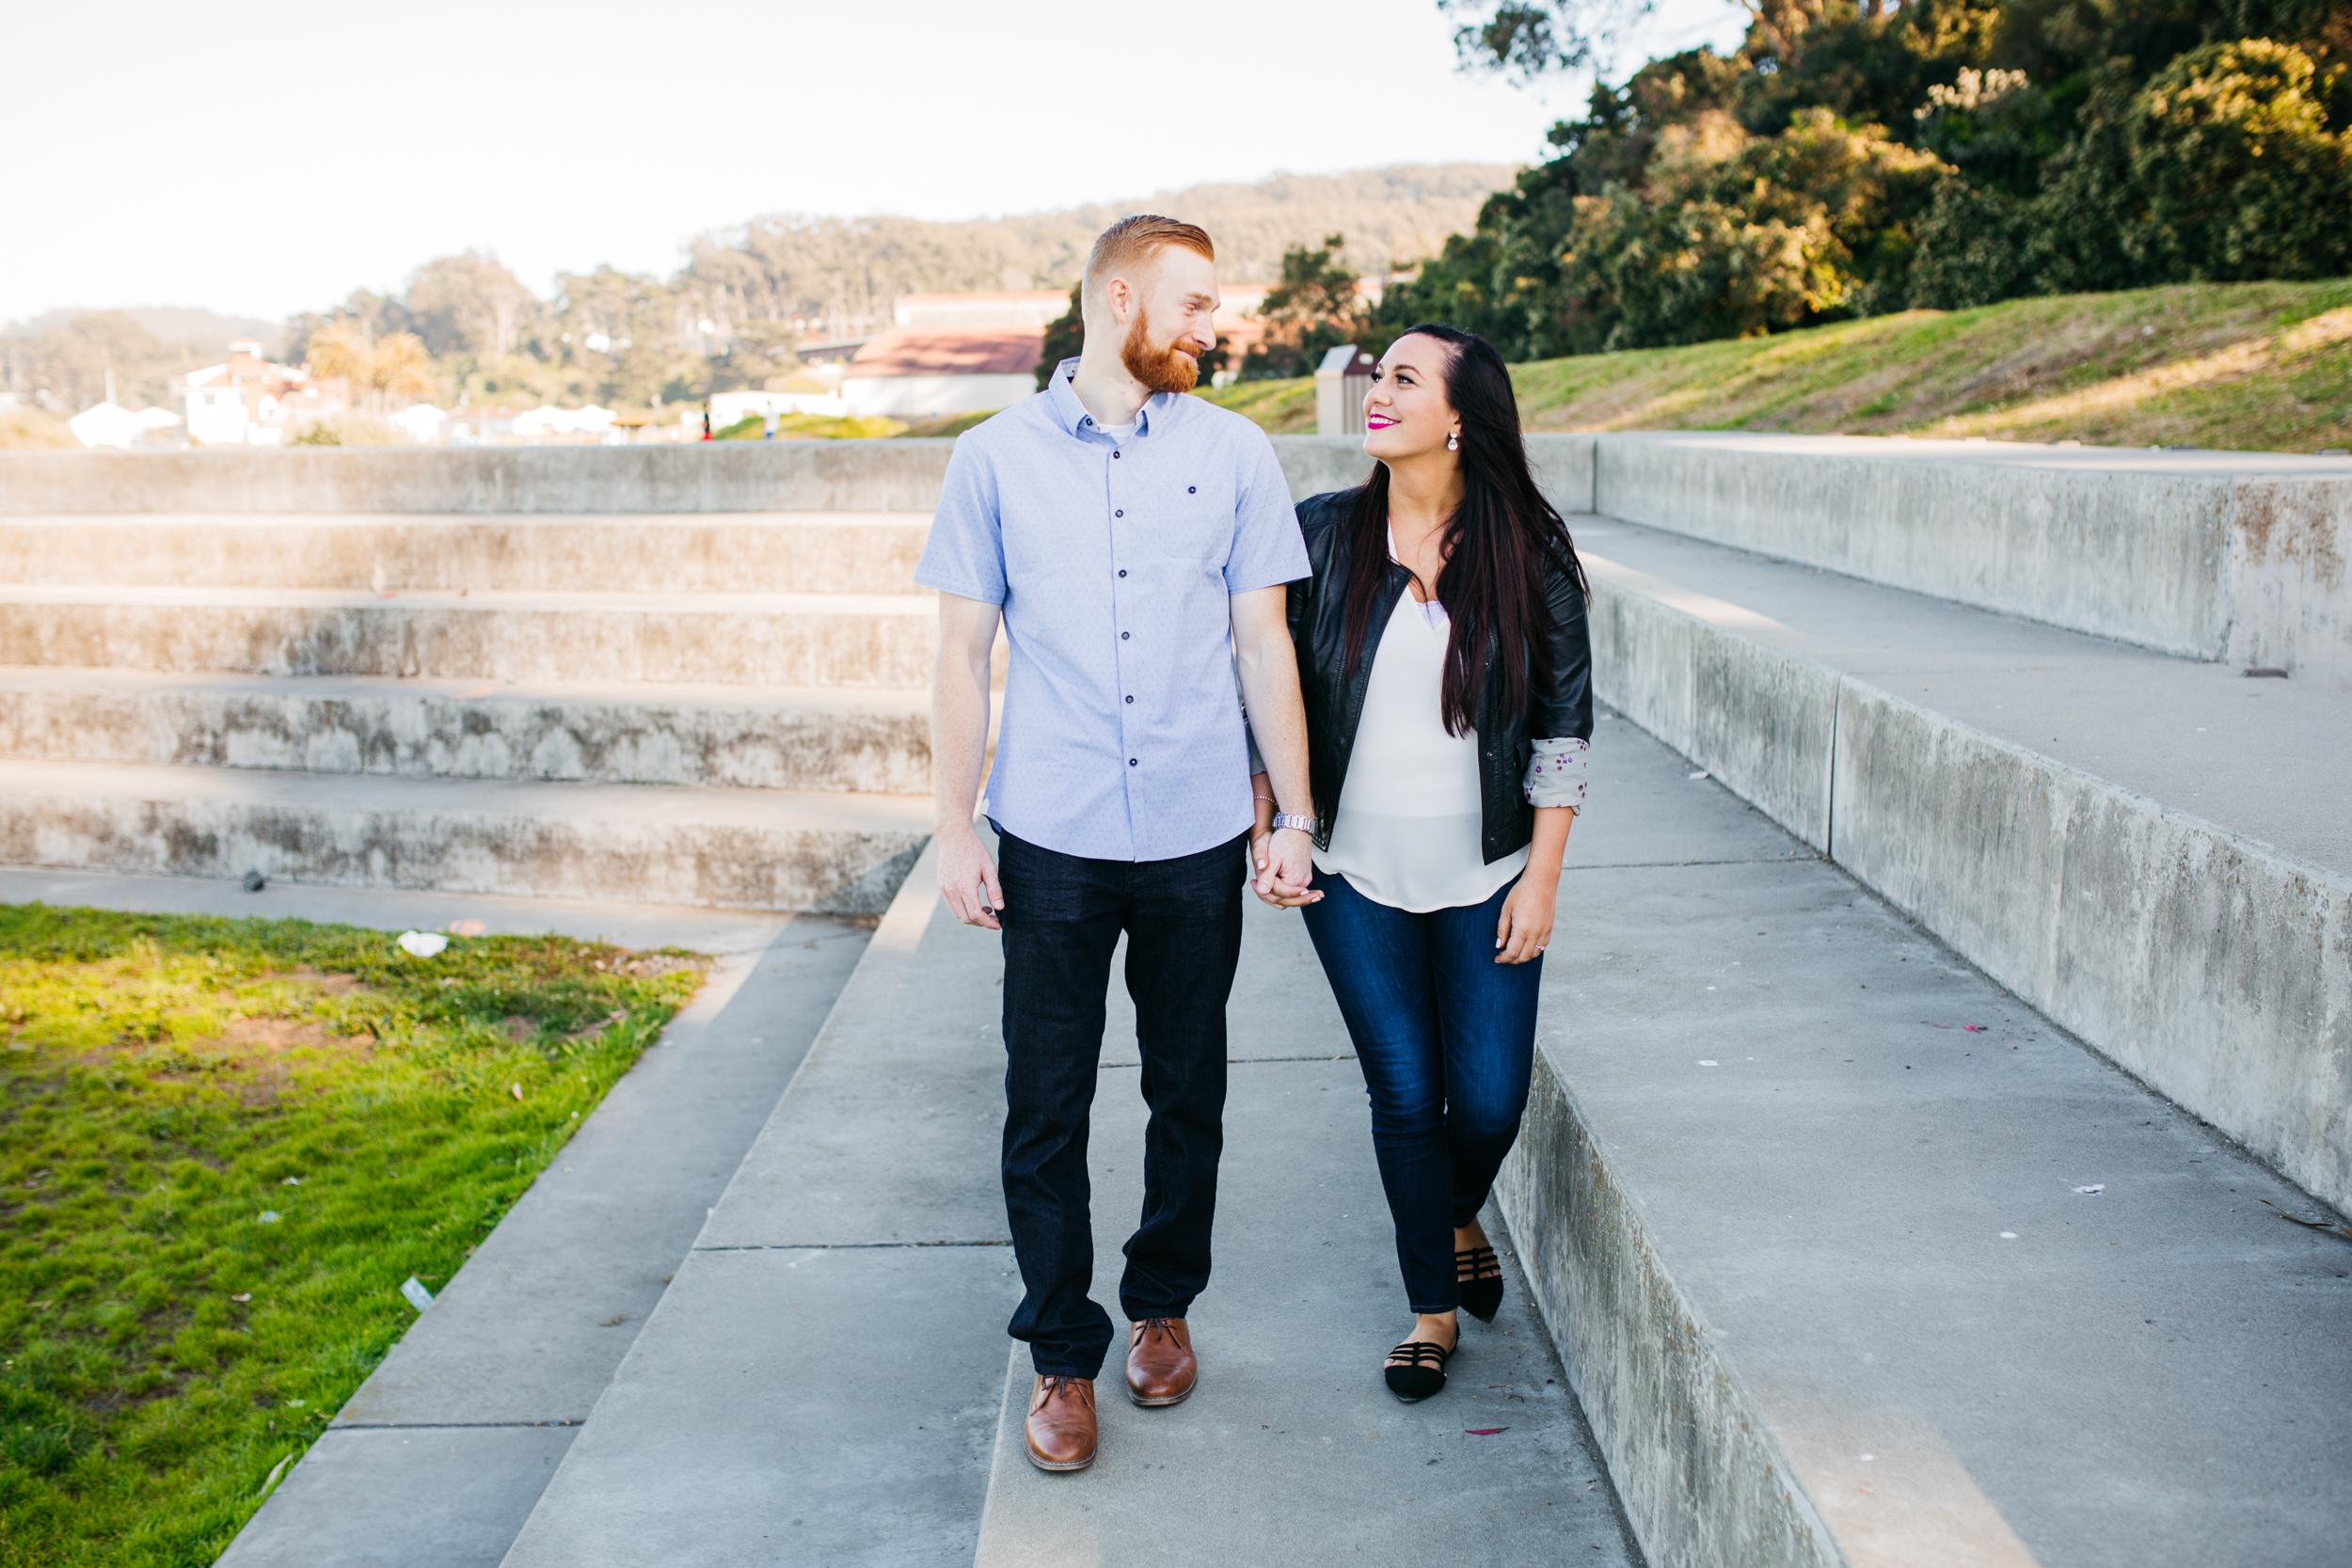 Engagement Photos-San Fransisco-Golden Gate Park-Ranalla Photo & Films-1.jpg